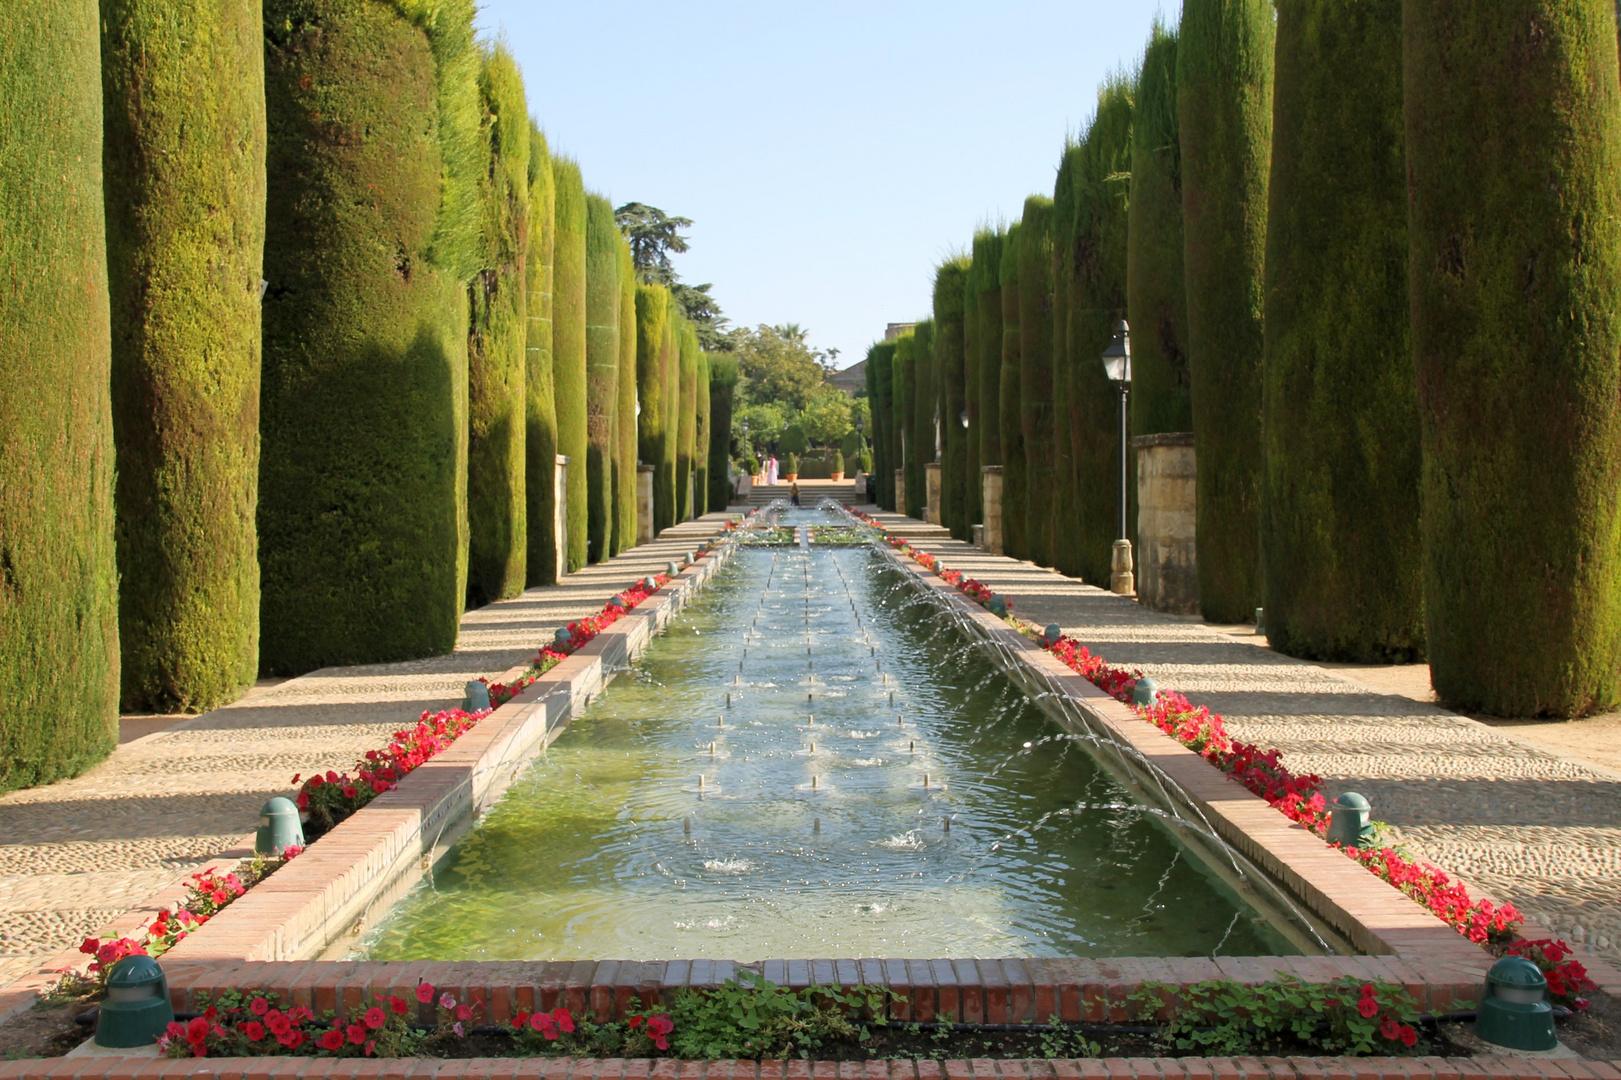 jardins de l'alcazar